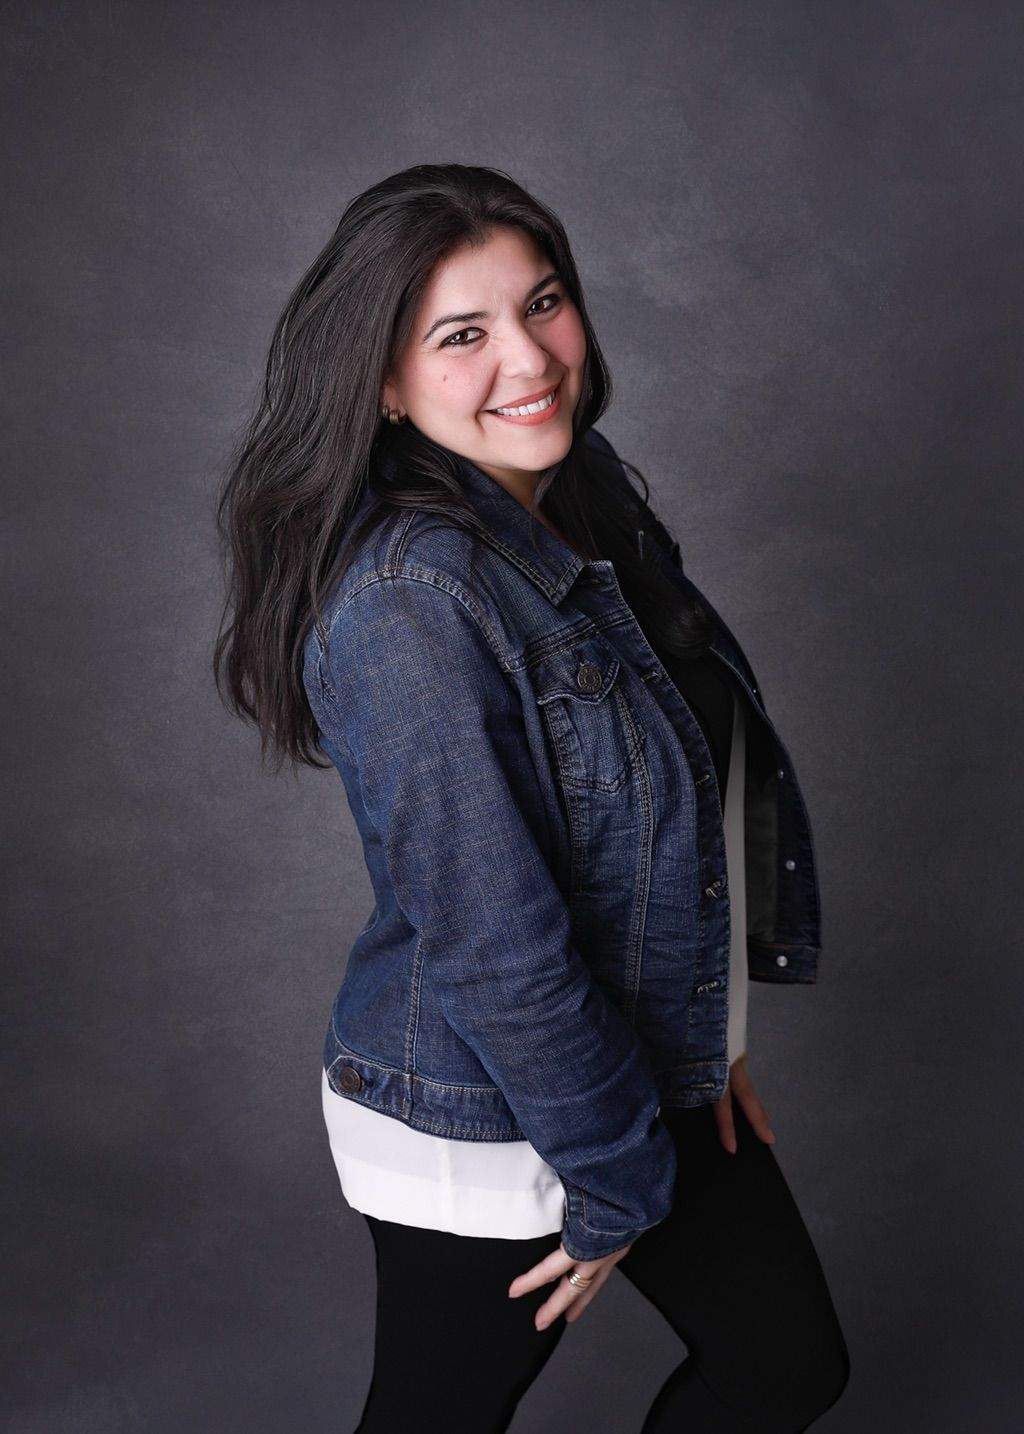 Iriana ICH Expression Photography